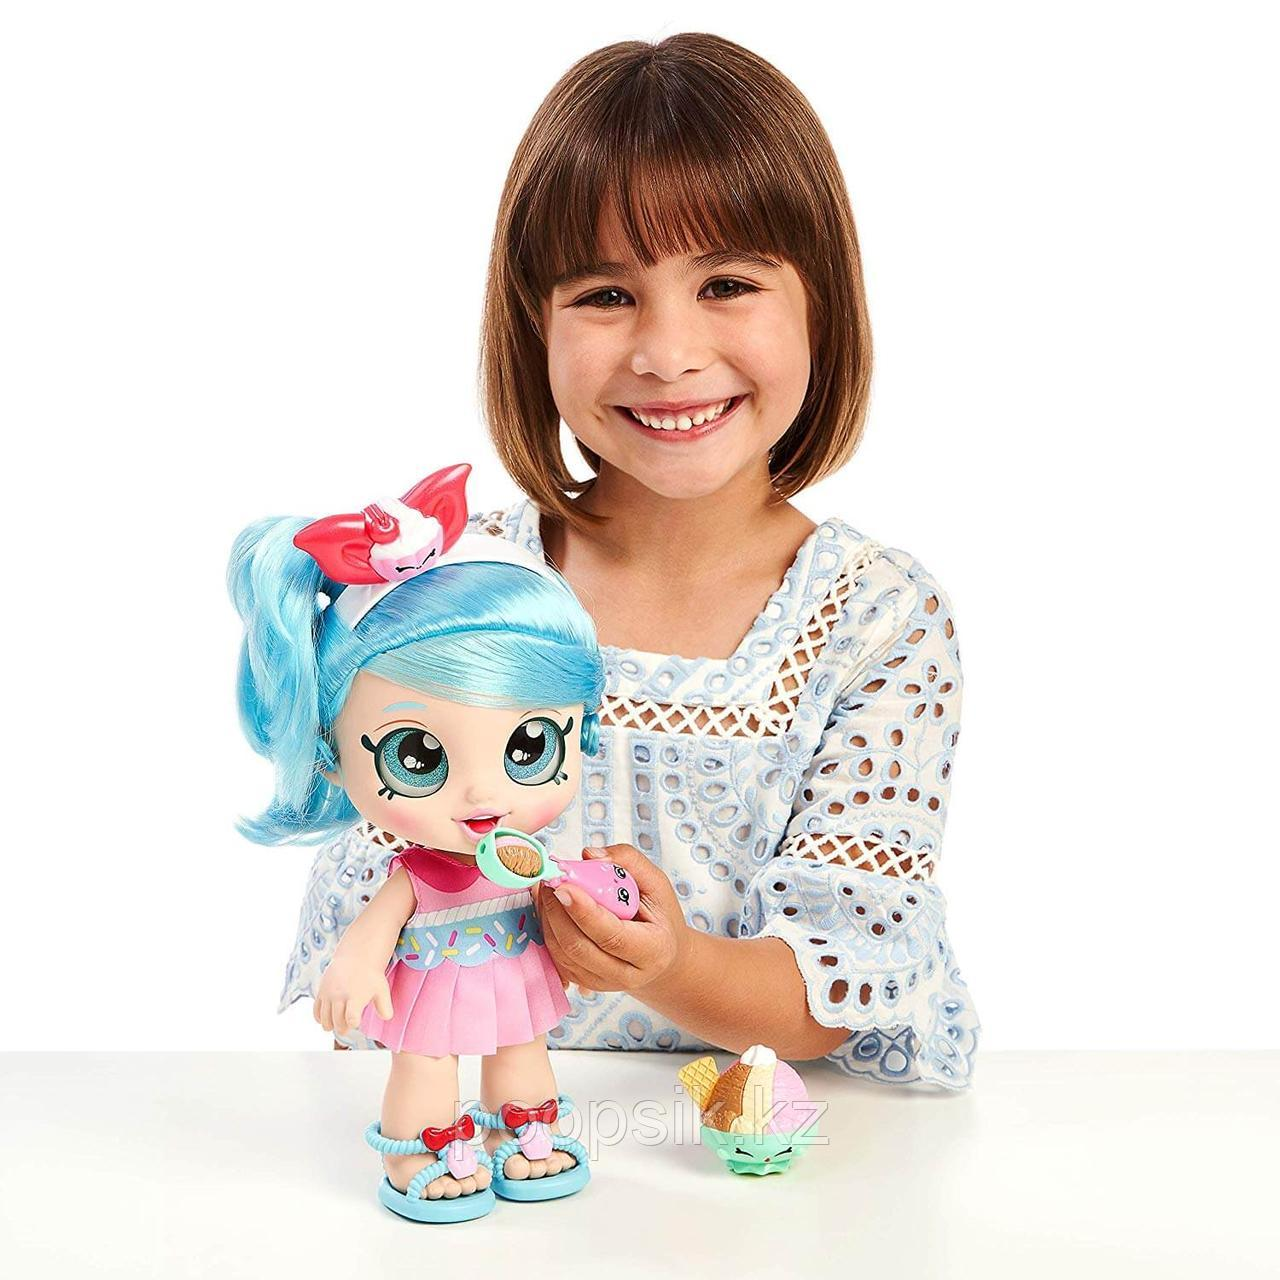 Кукла Кинди Кидс Джейсикейк (Пироженка) 25см - фото 3